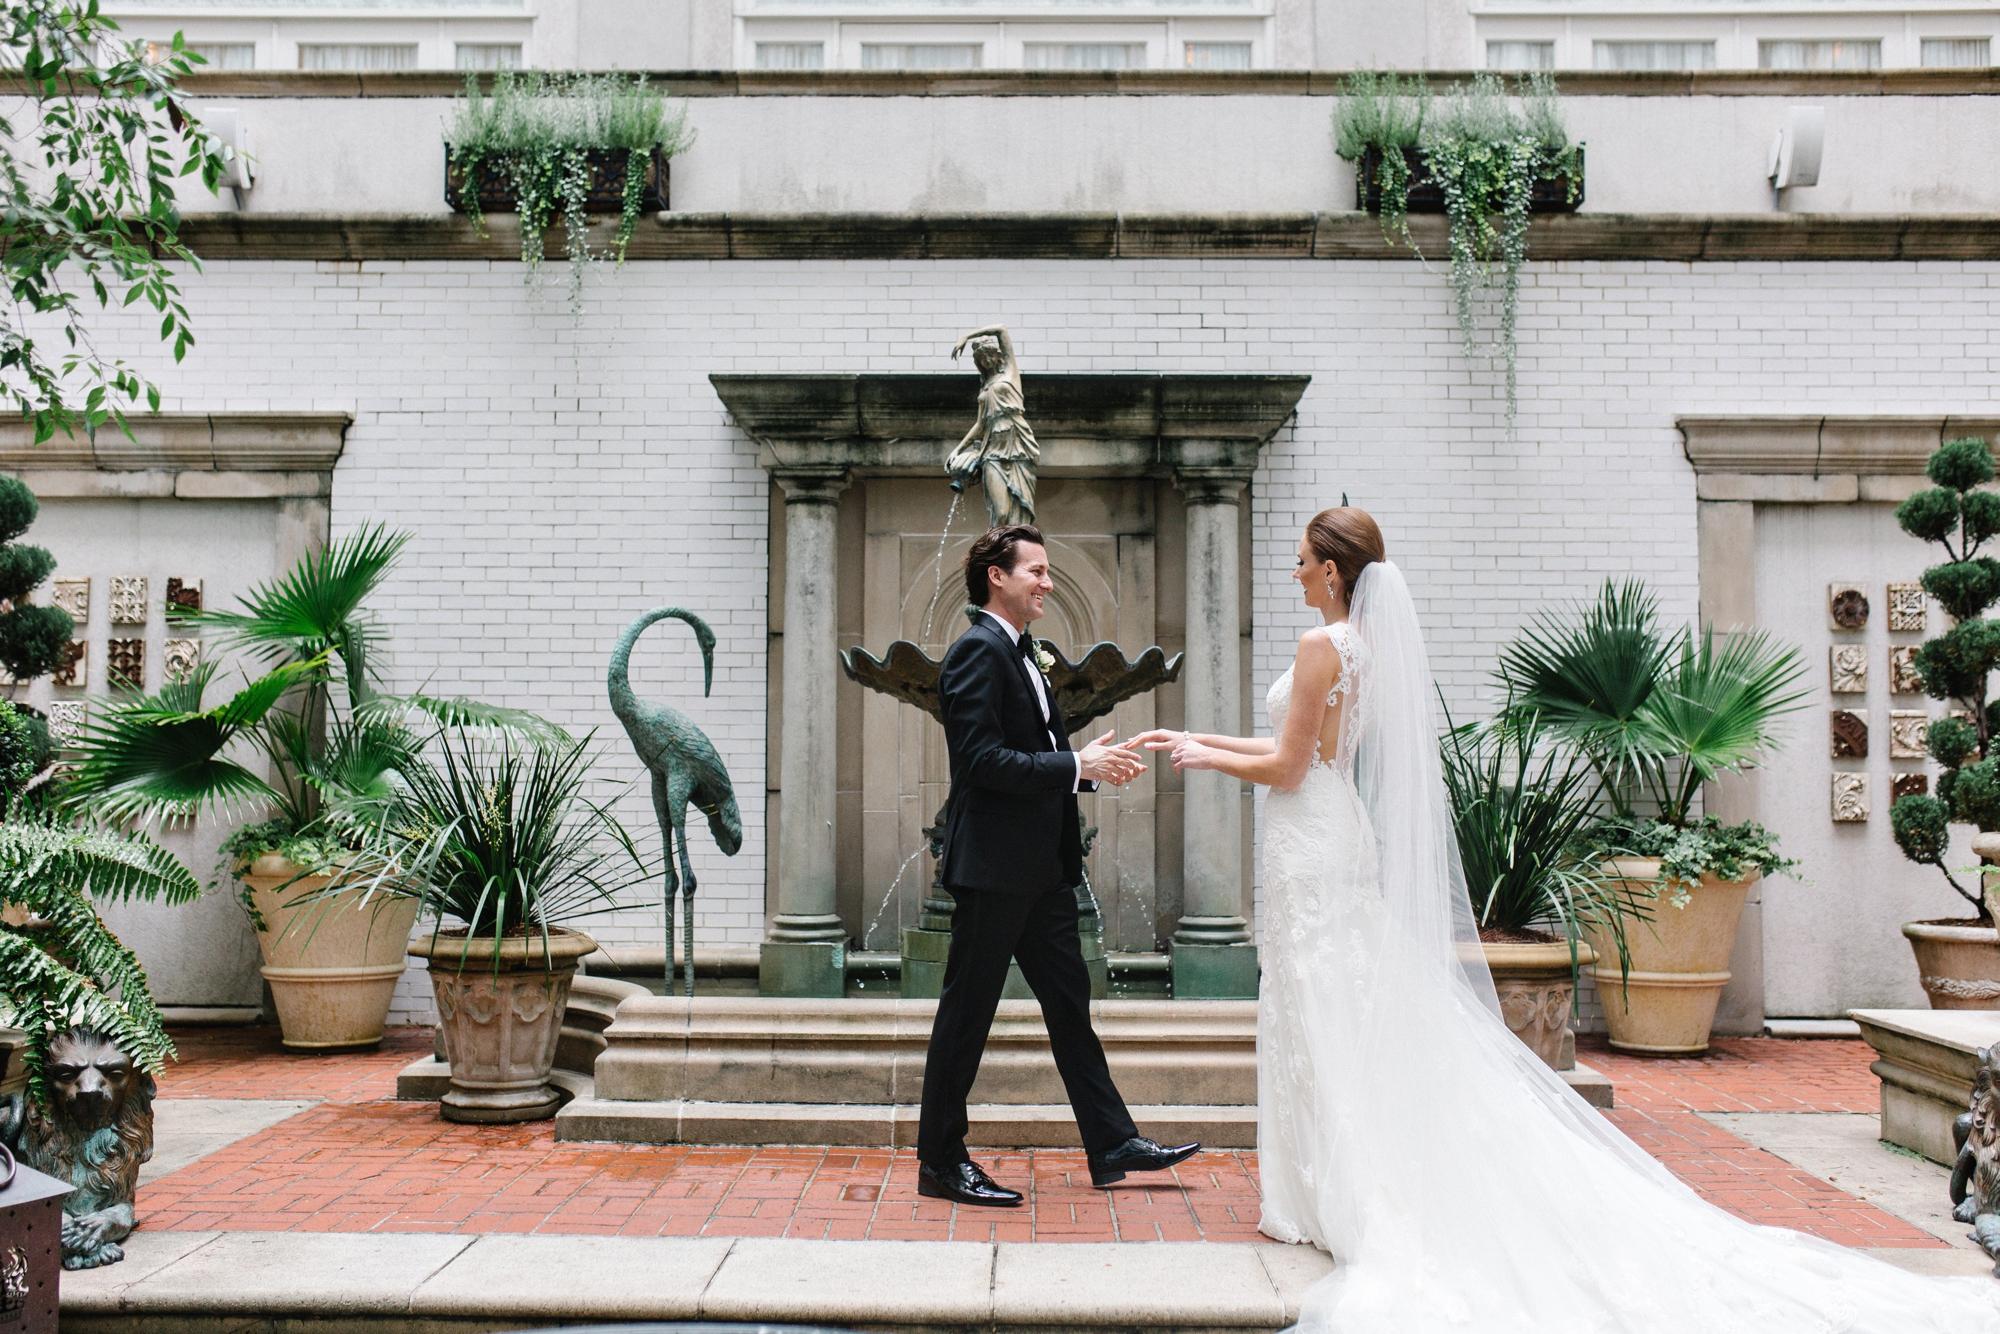 New_Orleans_Wedding_Photographer_1105.jpg